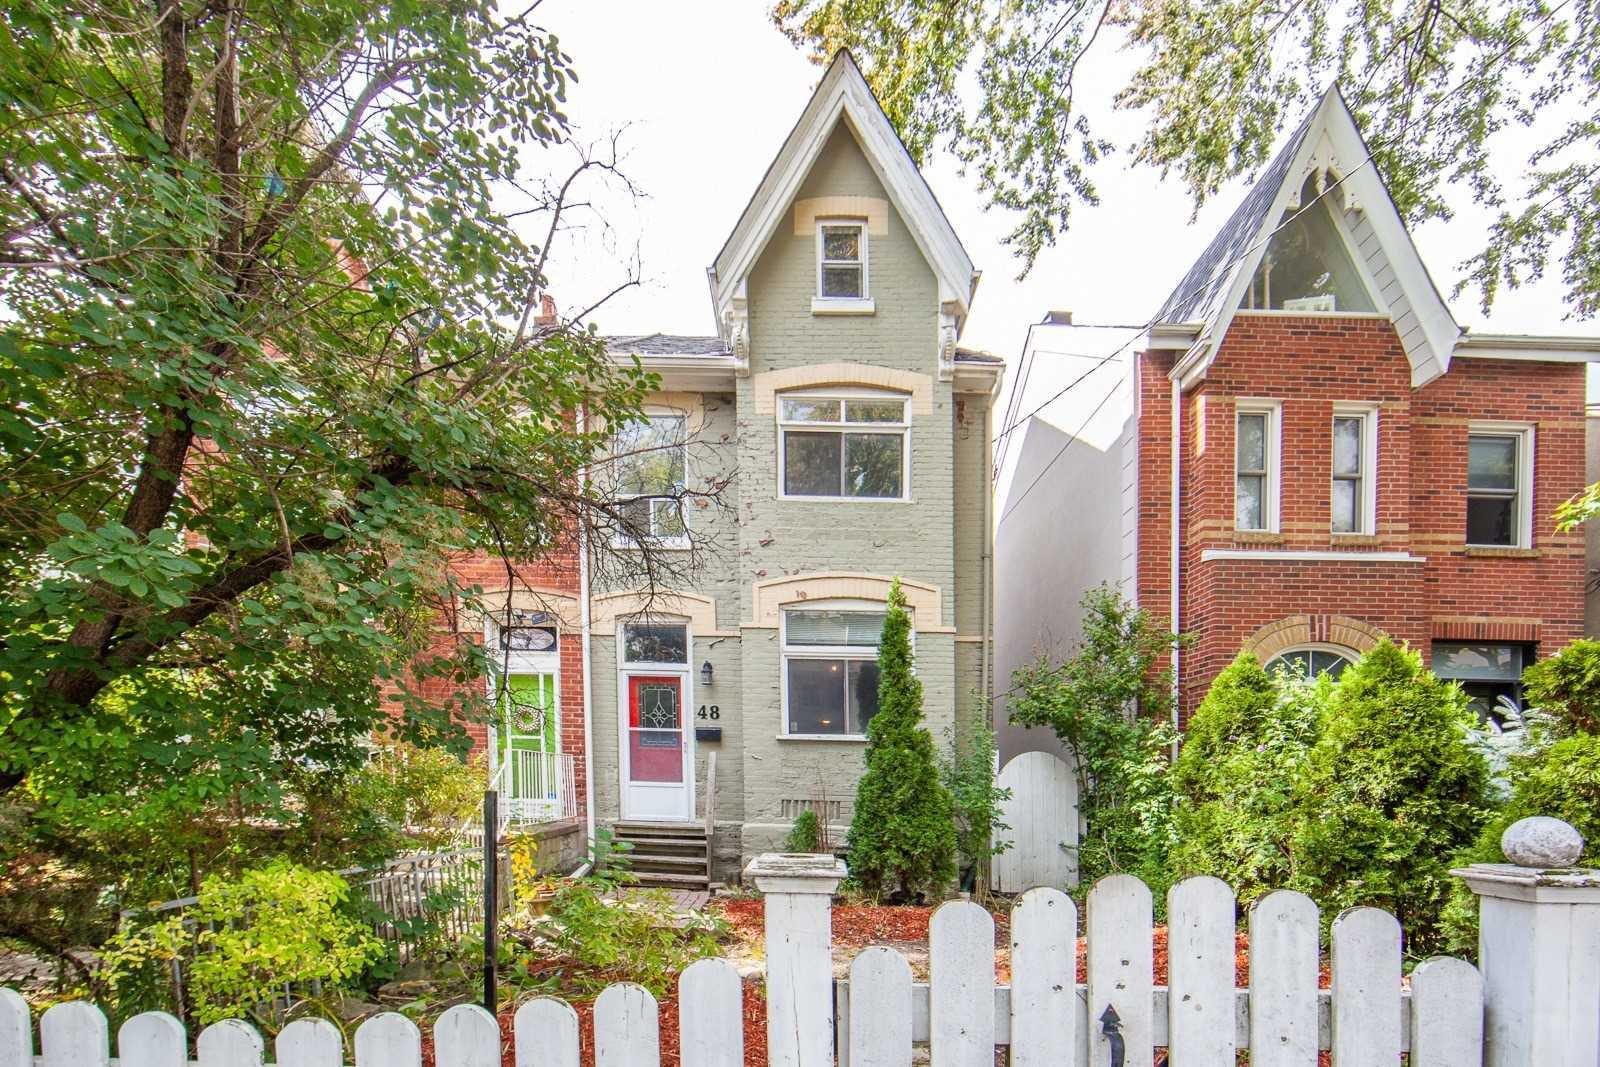 Main Photo: 48 Saulter Street in Toronto: South Riverdale House (2 1/2 Storey) for sale (Toronto E01)  : MLS®# E4933195